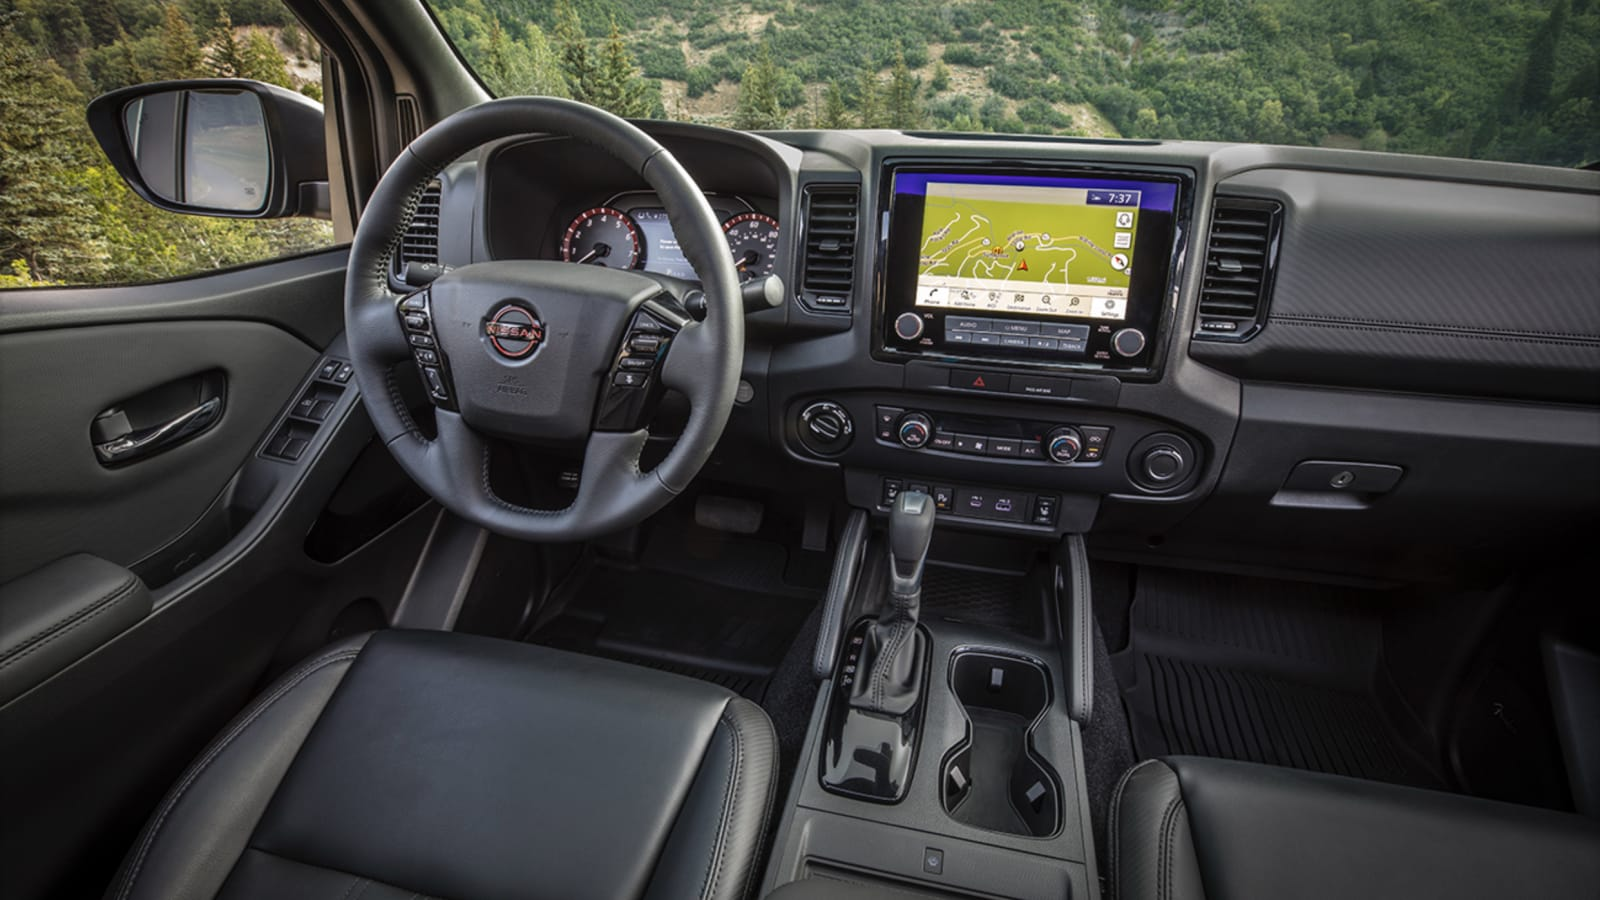 2022 Nissan Frontier Erste Fahrt Bewertung